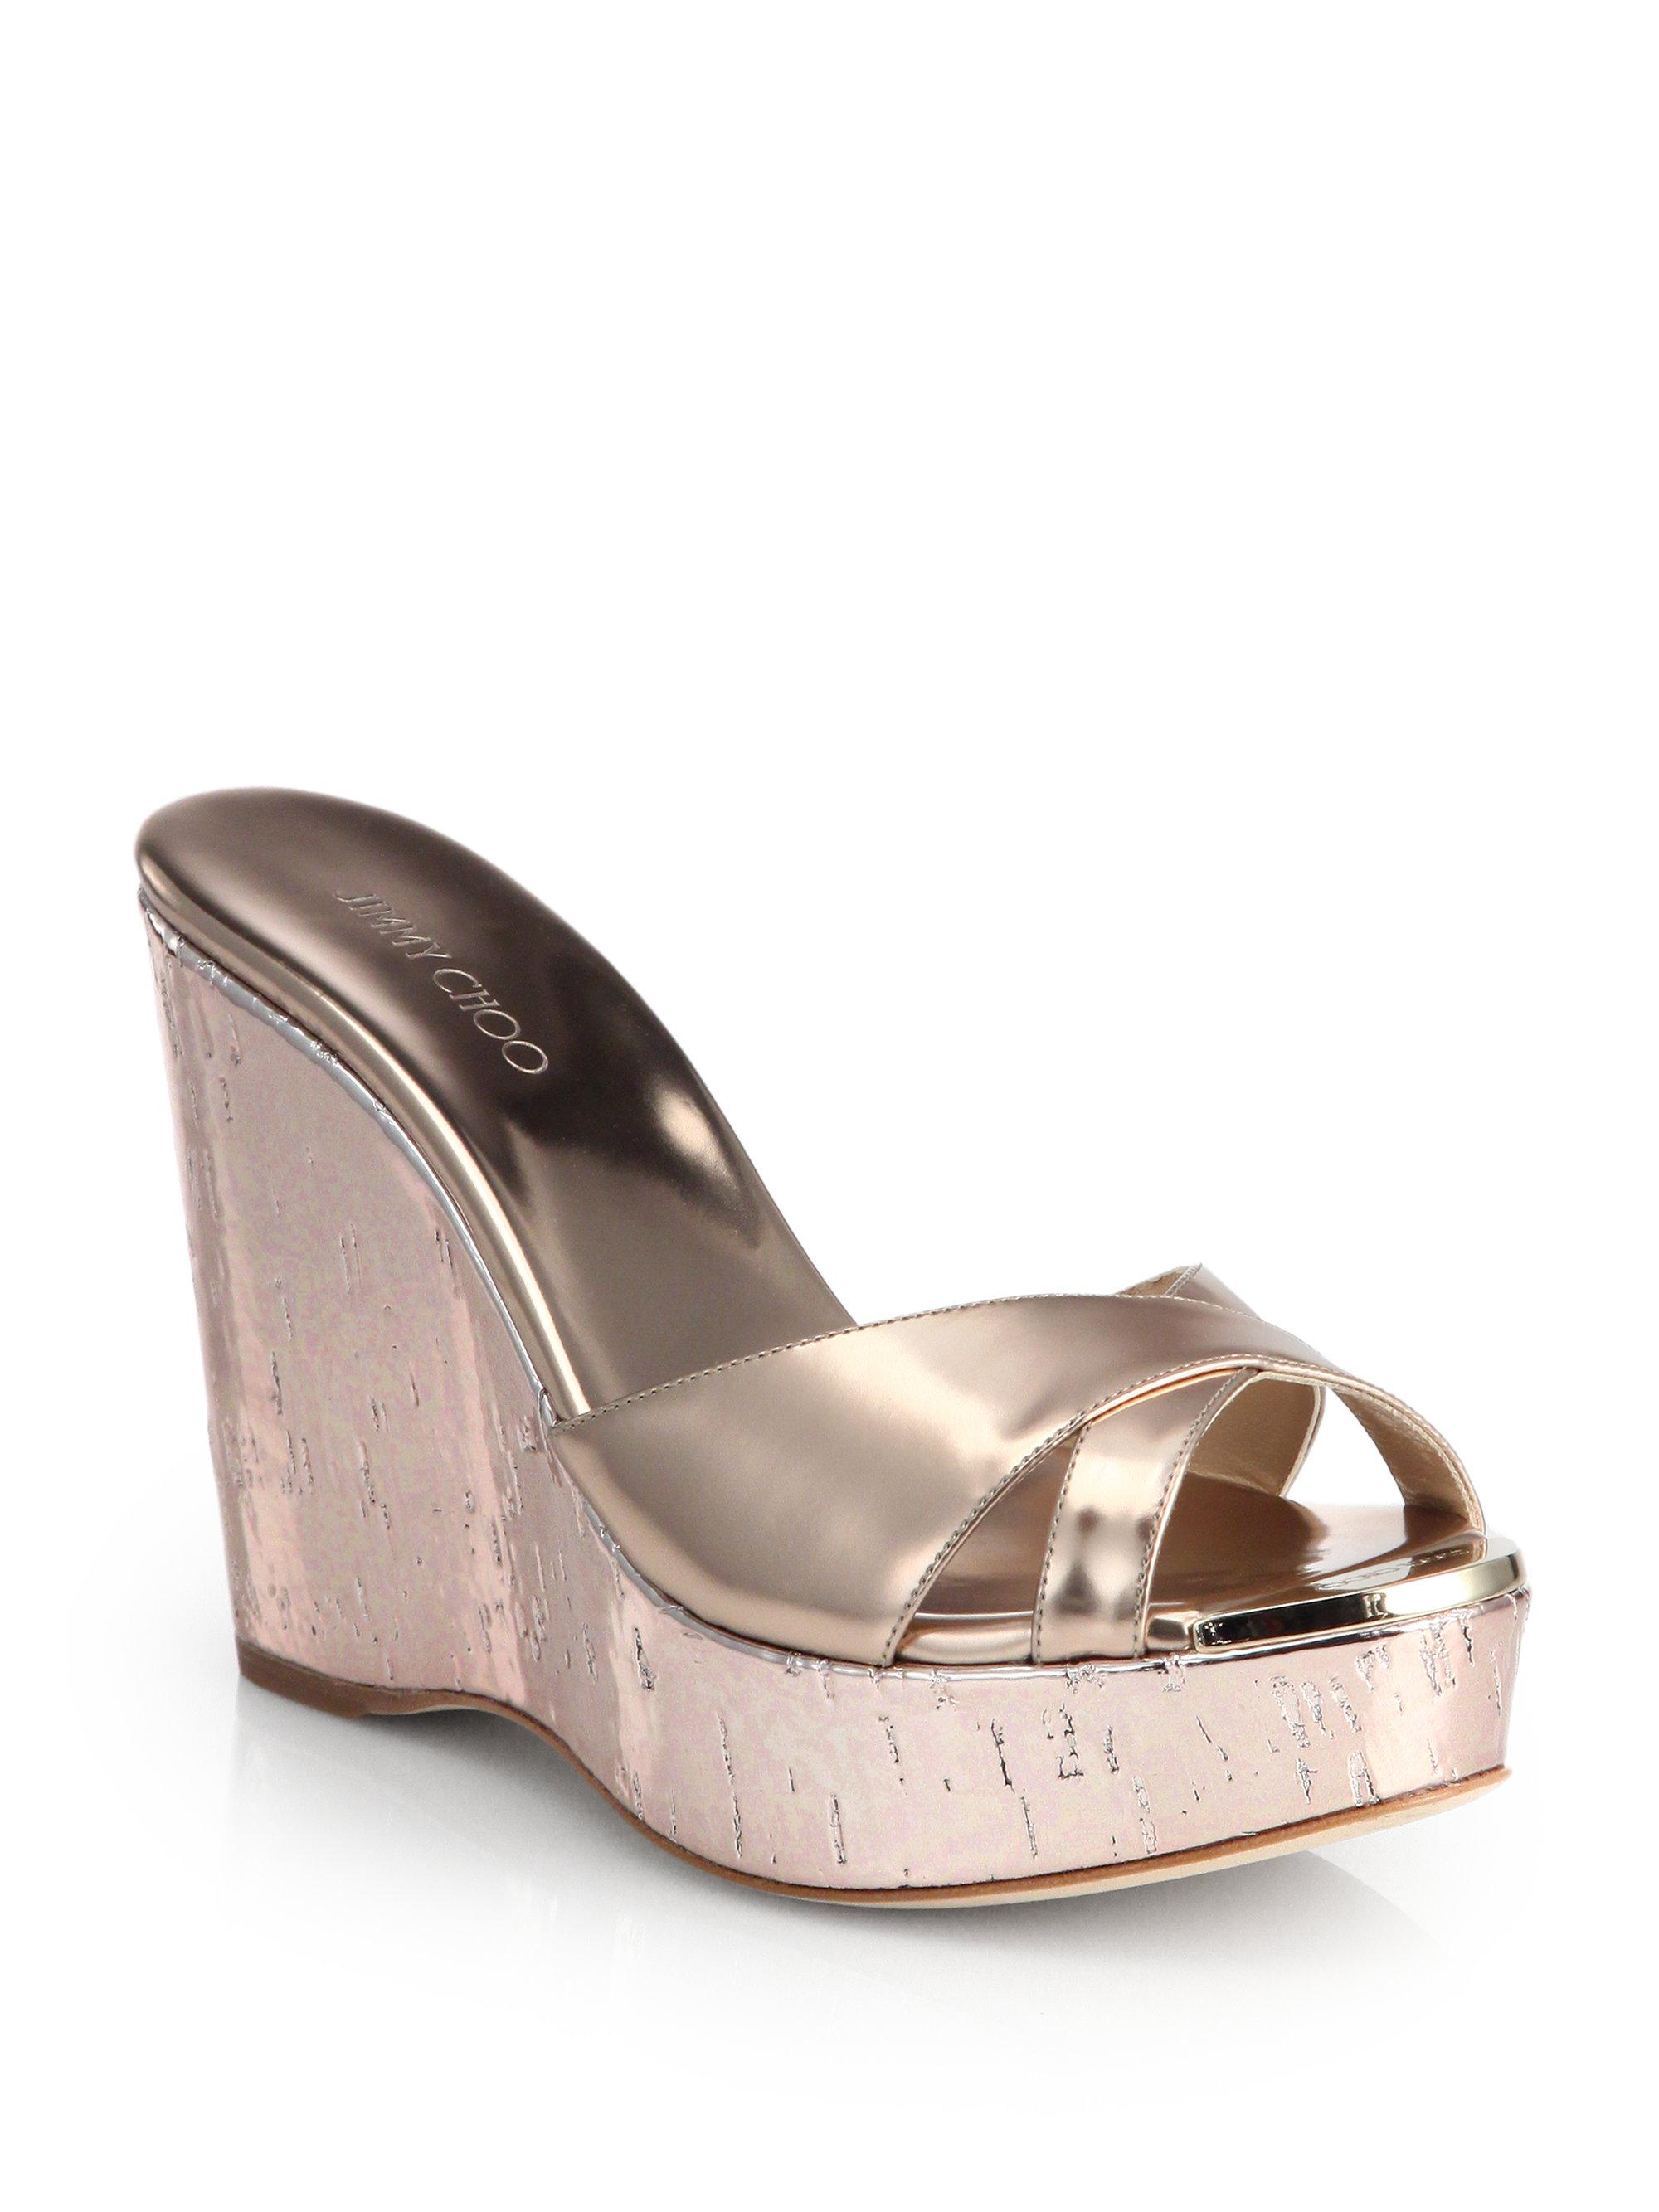 f1cdd55bfb32 ... discount lyst jimmy choo perfume metallic cork wedge sandals in  metallic 33b3e 3ef96